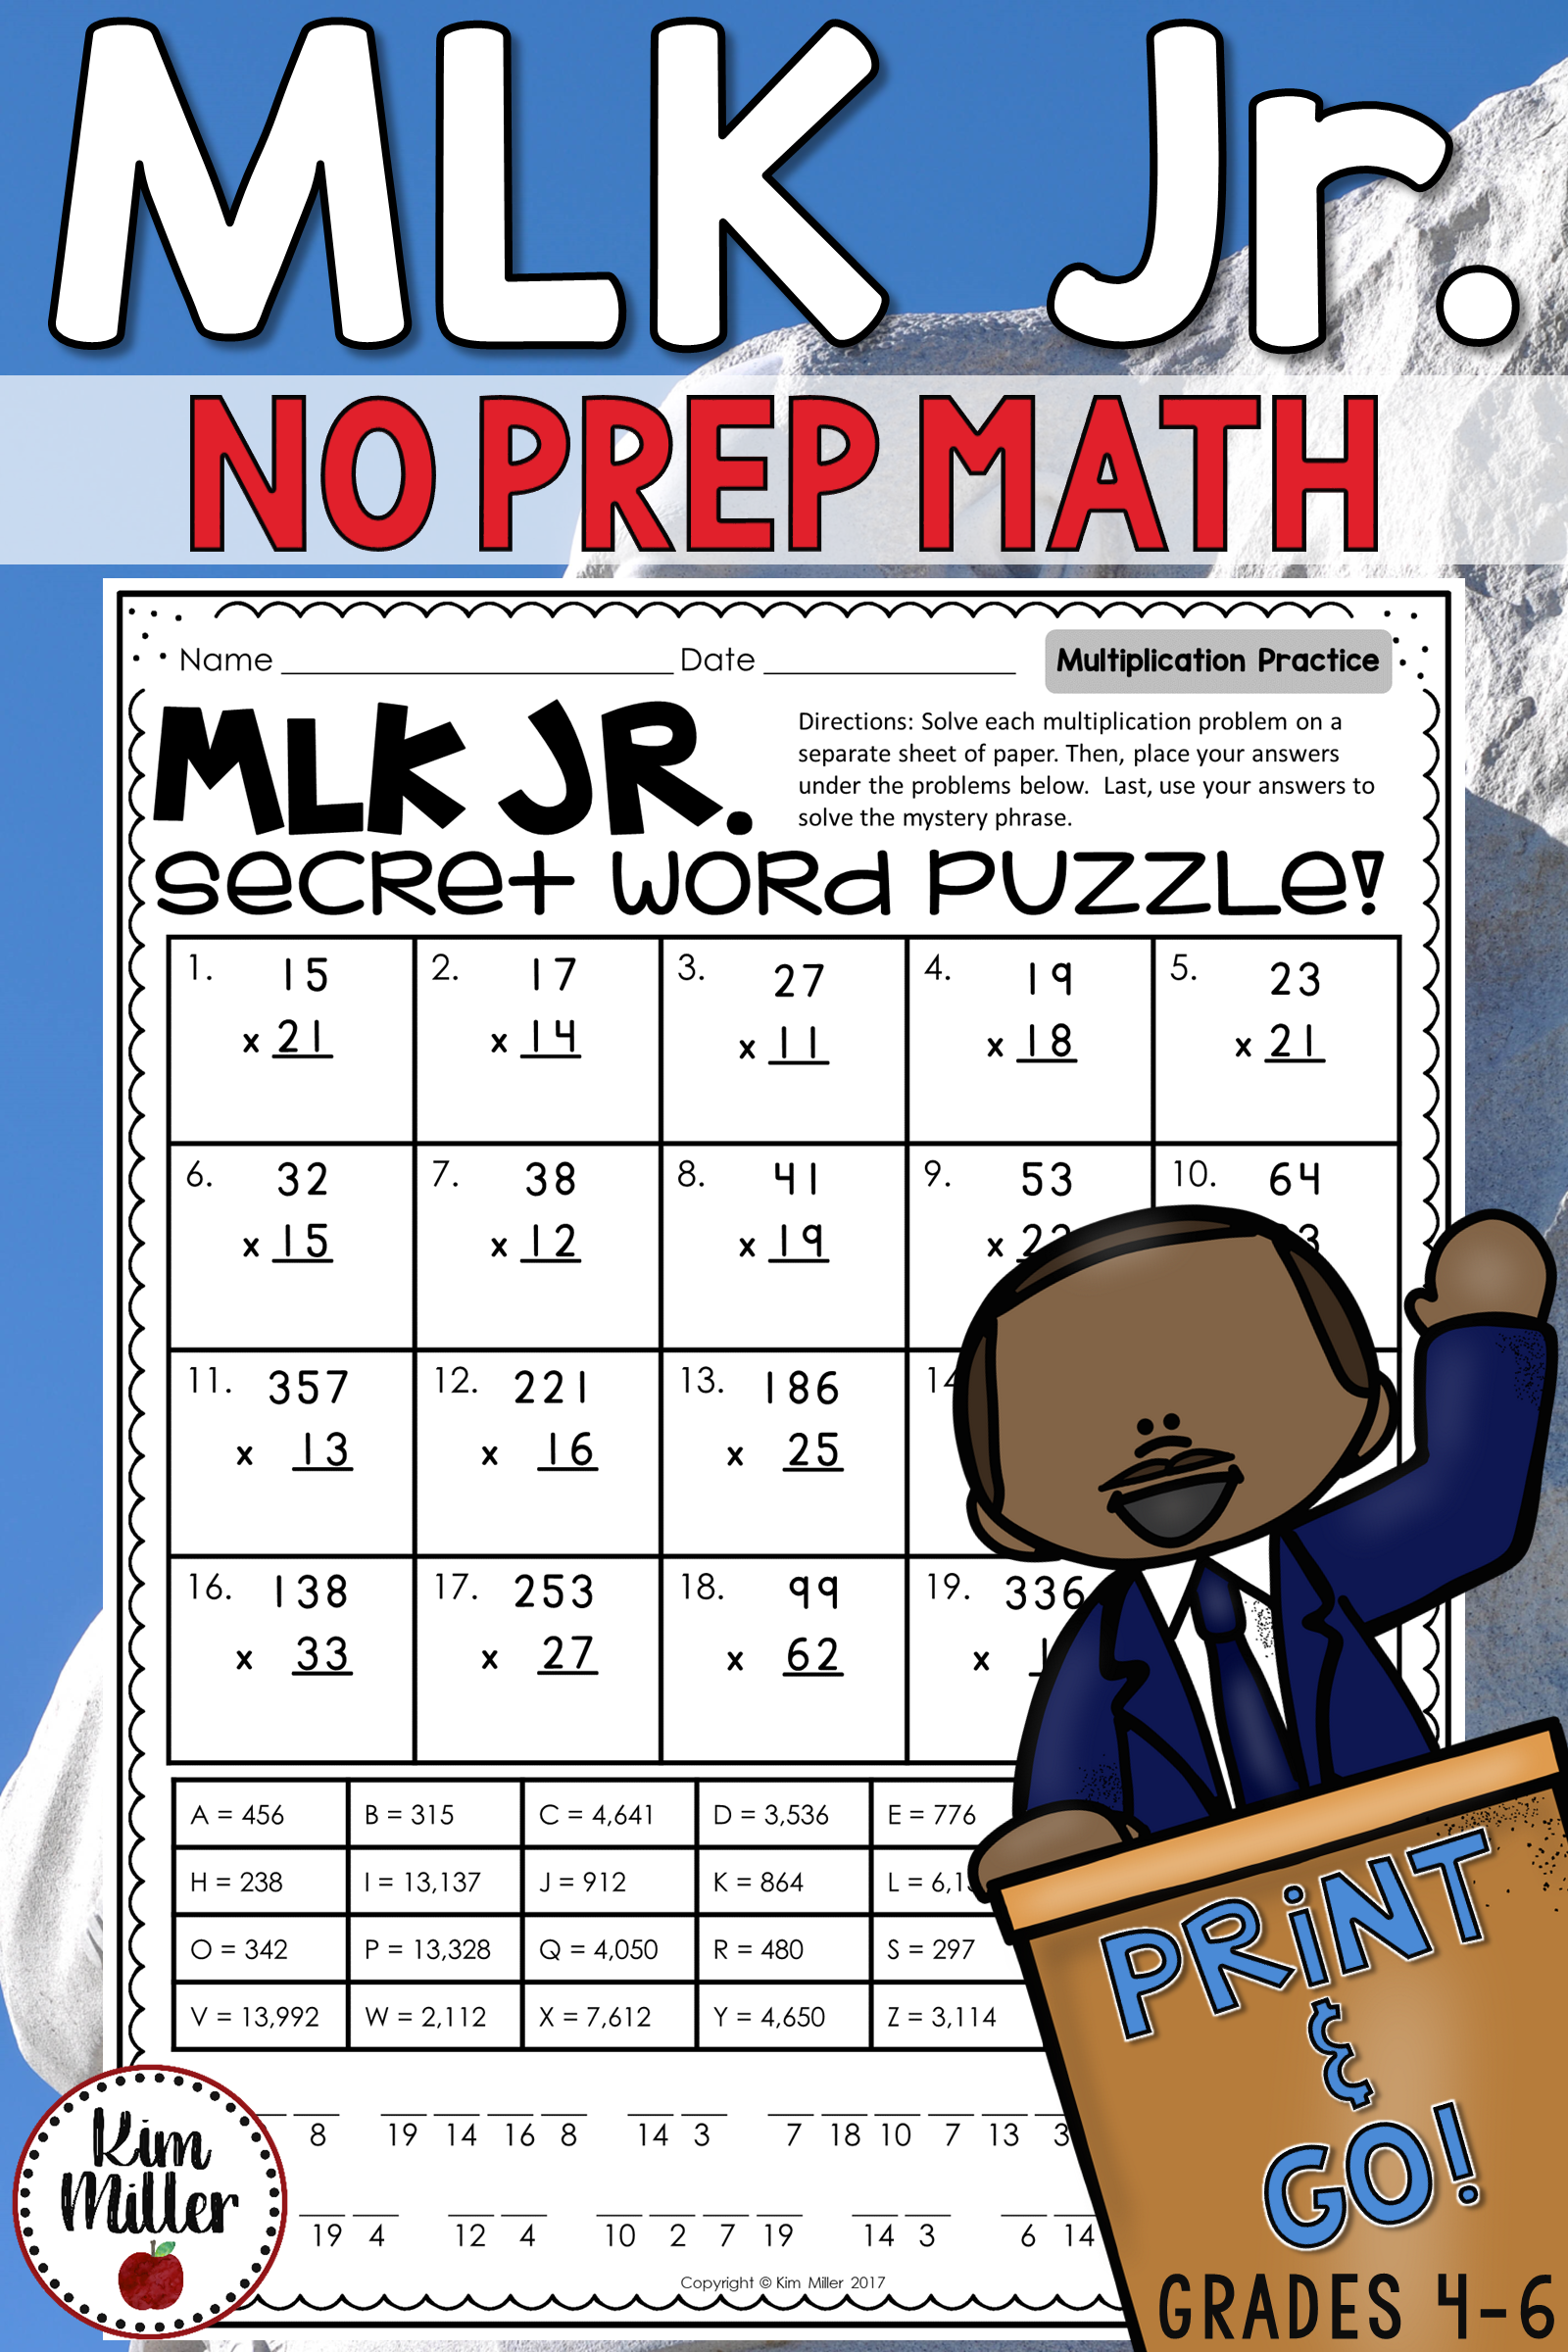 Martin Luther King Jr No Prep Math Worksheets